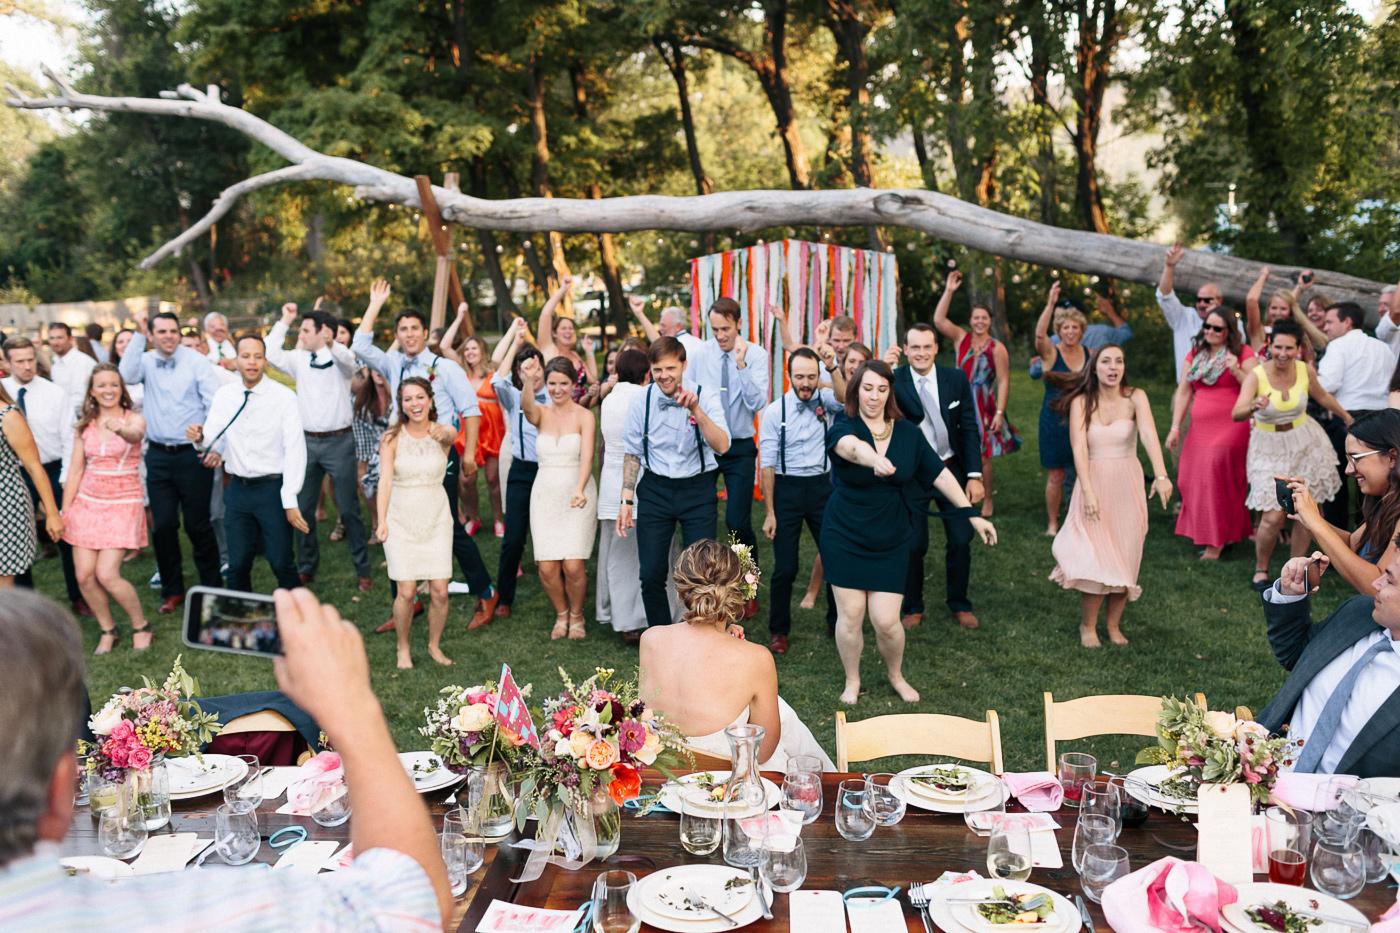 Lyons-Farmette-Wedding-Photographer-Lucy-Austin-Flash-Mob-Dance-52.jpg